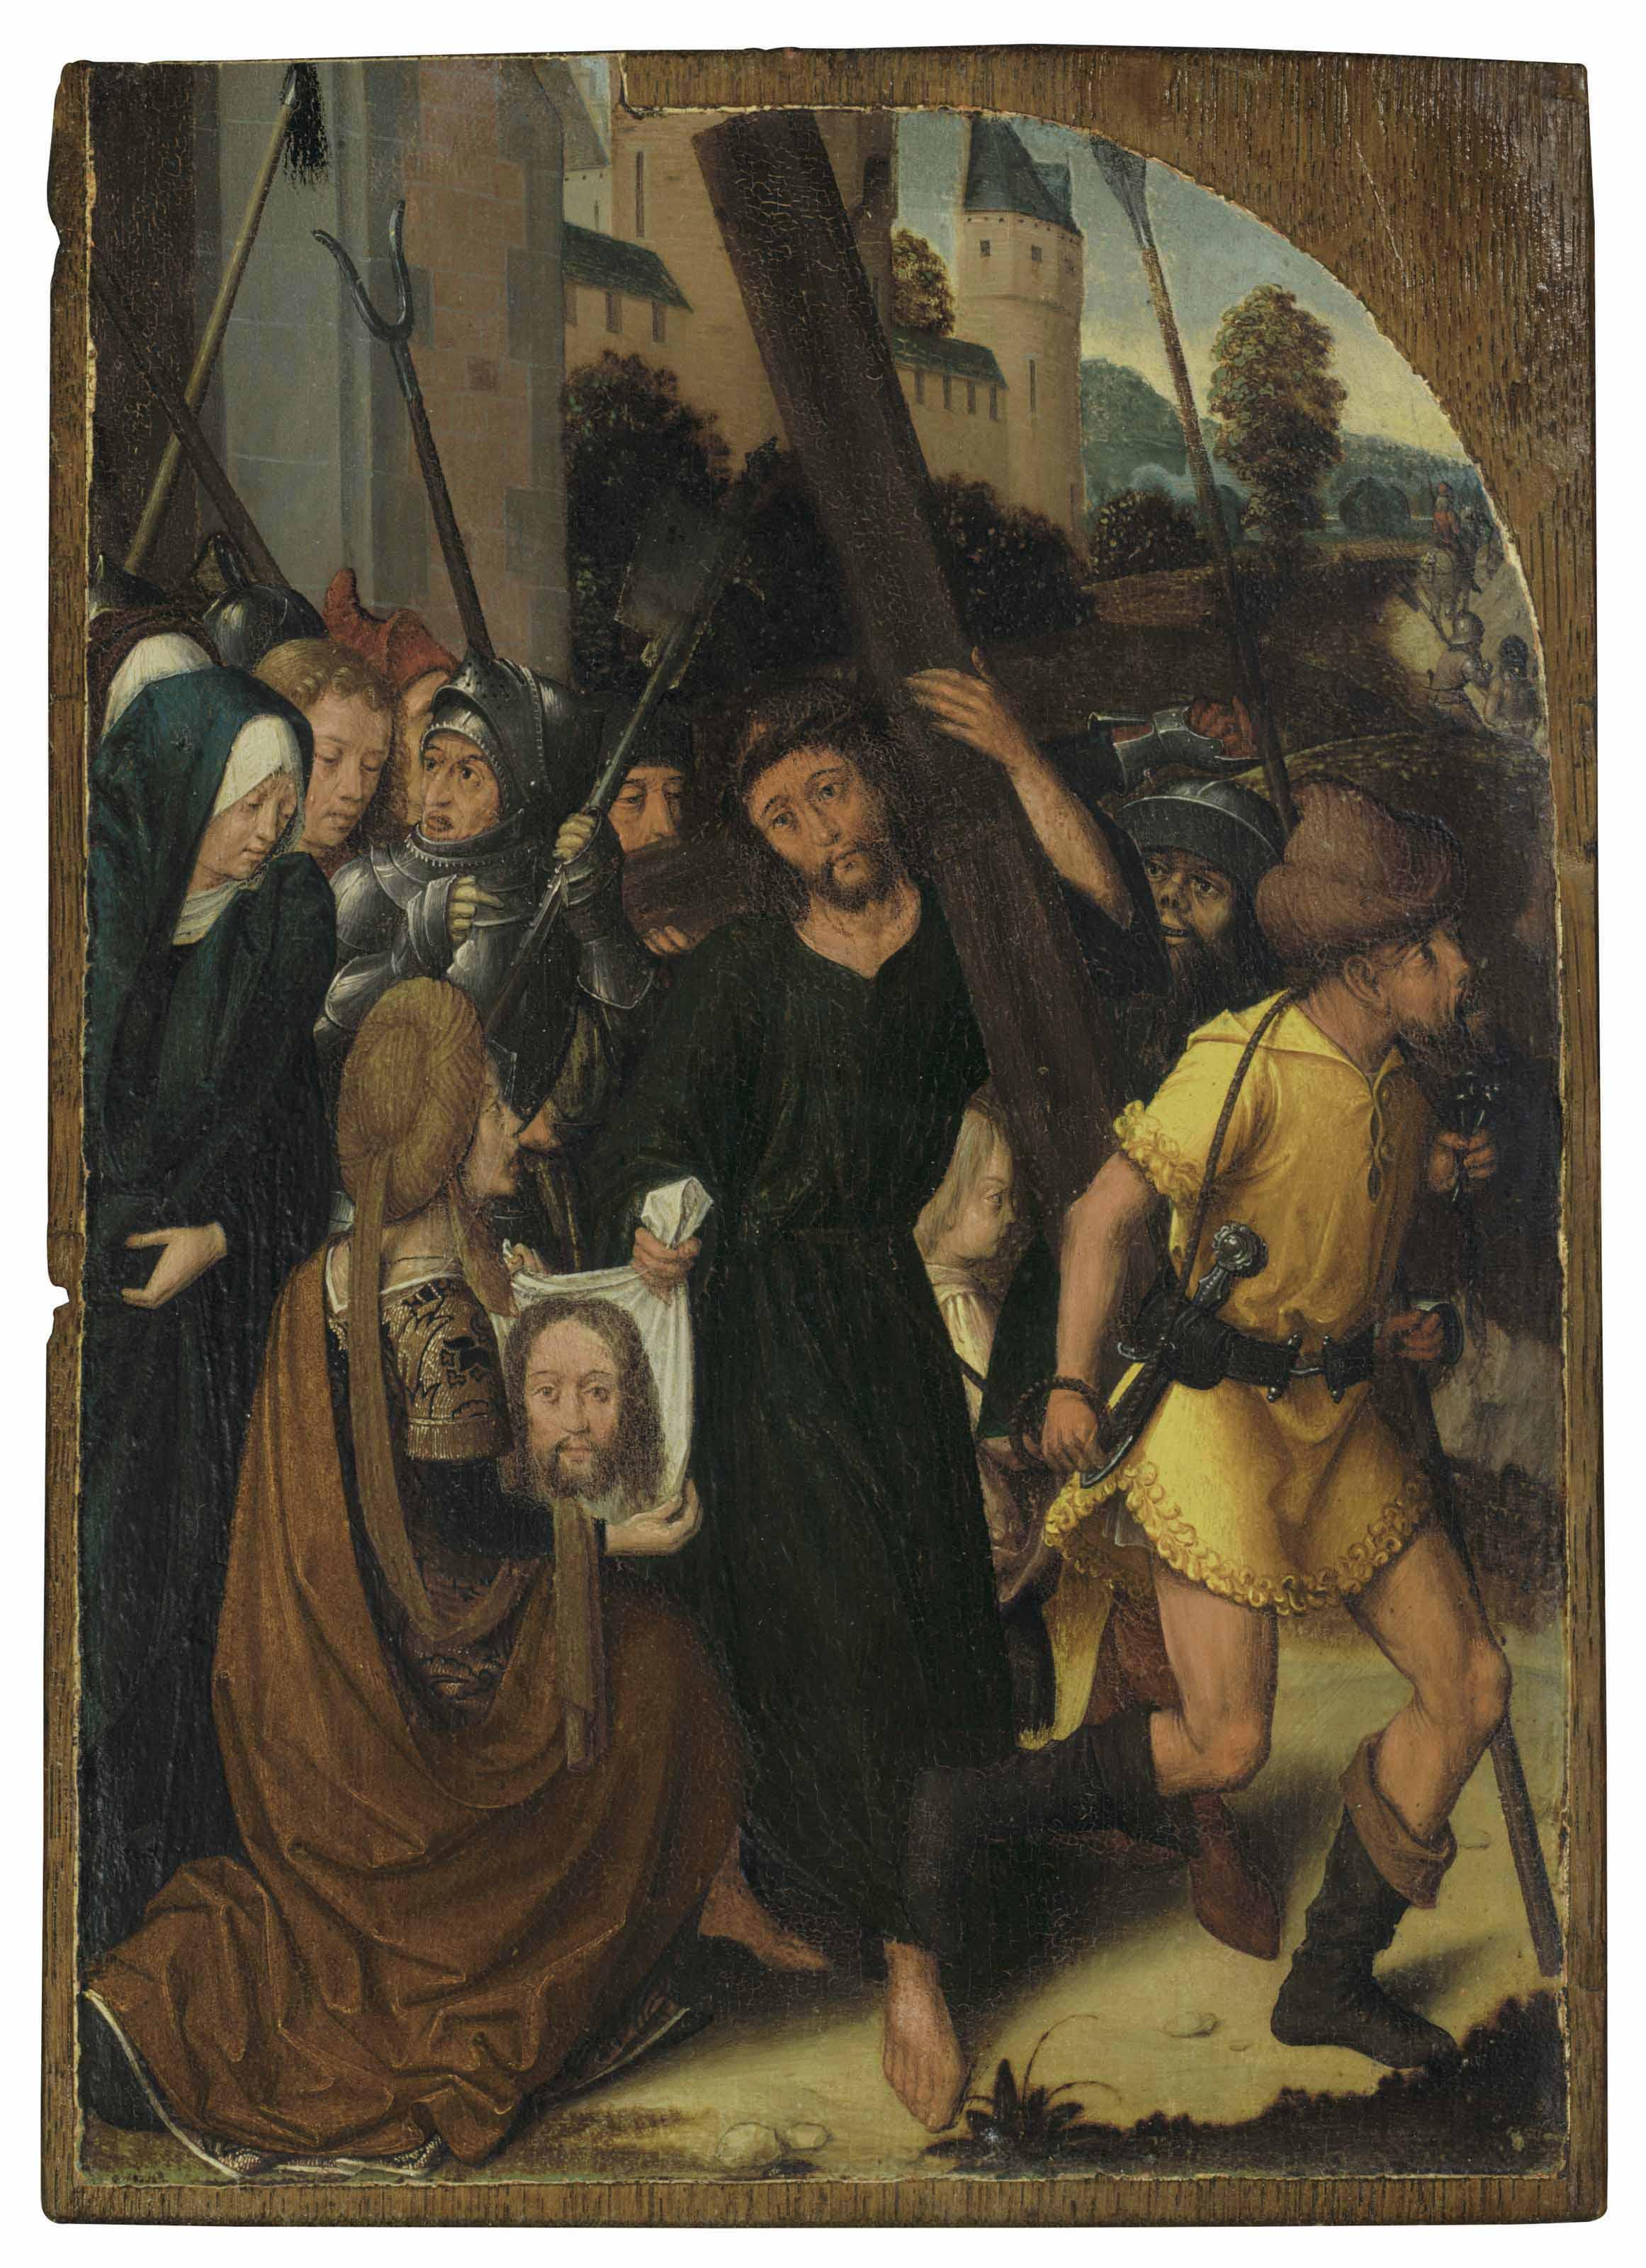 Netherlandish School, last quarter of the 15th Century, after Martin Schongauer